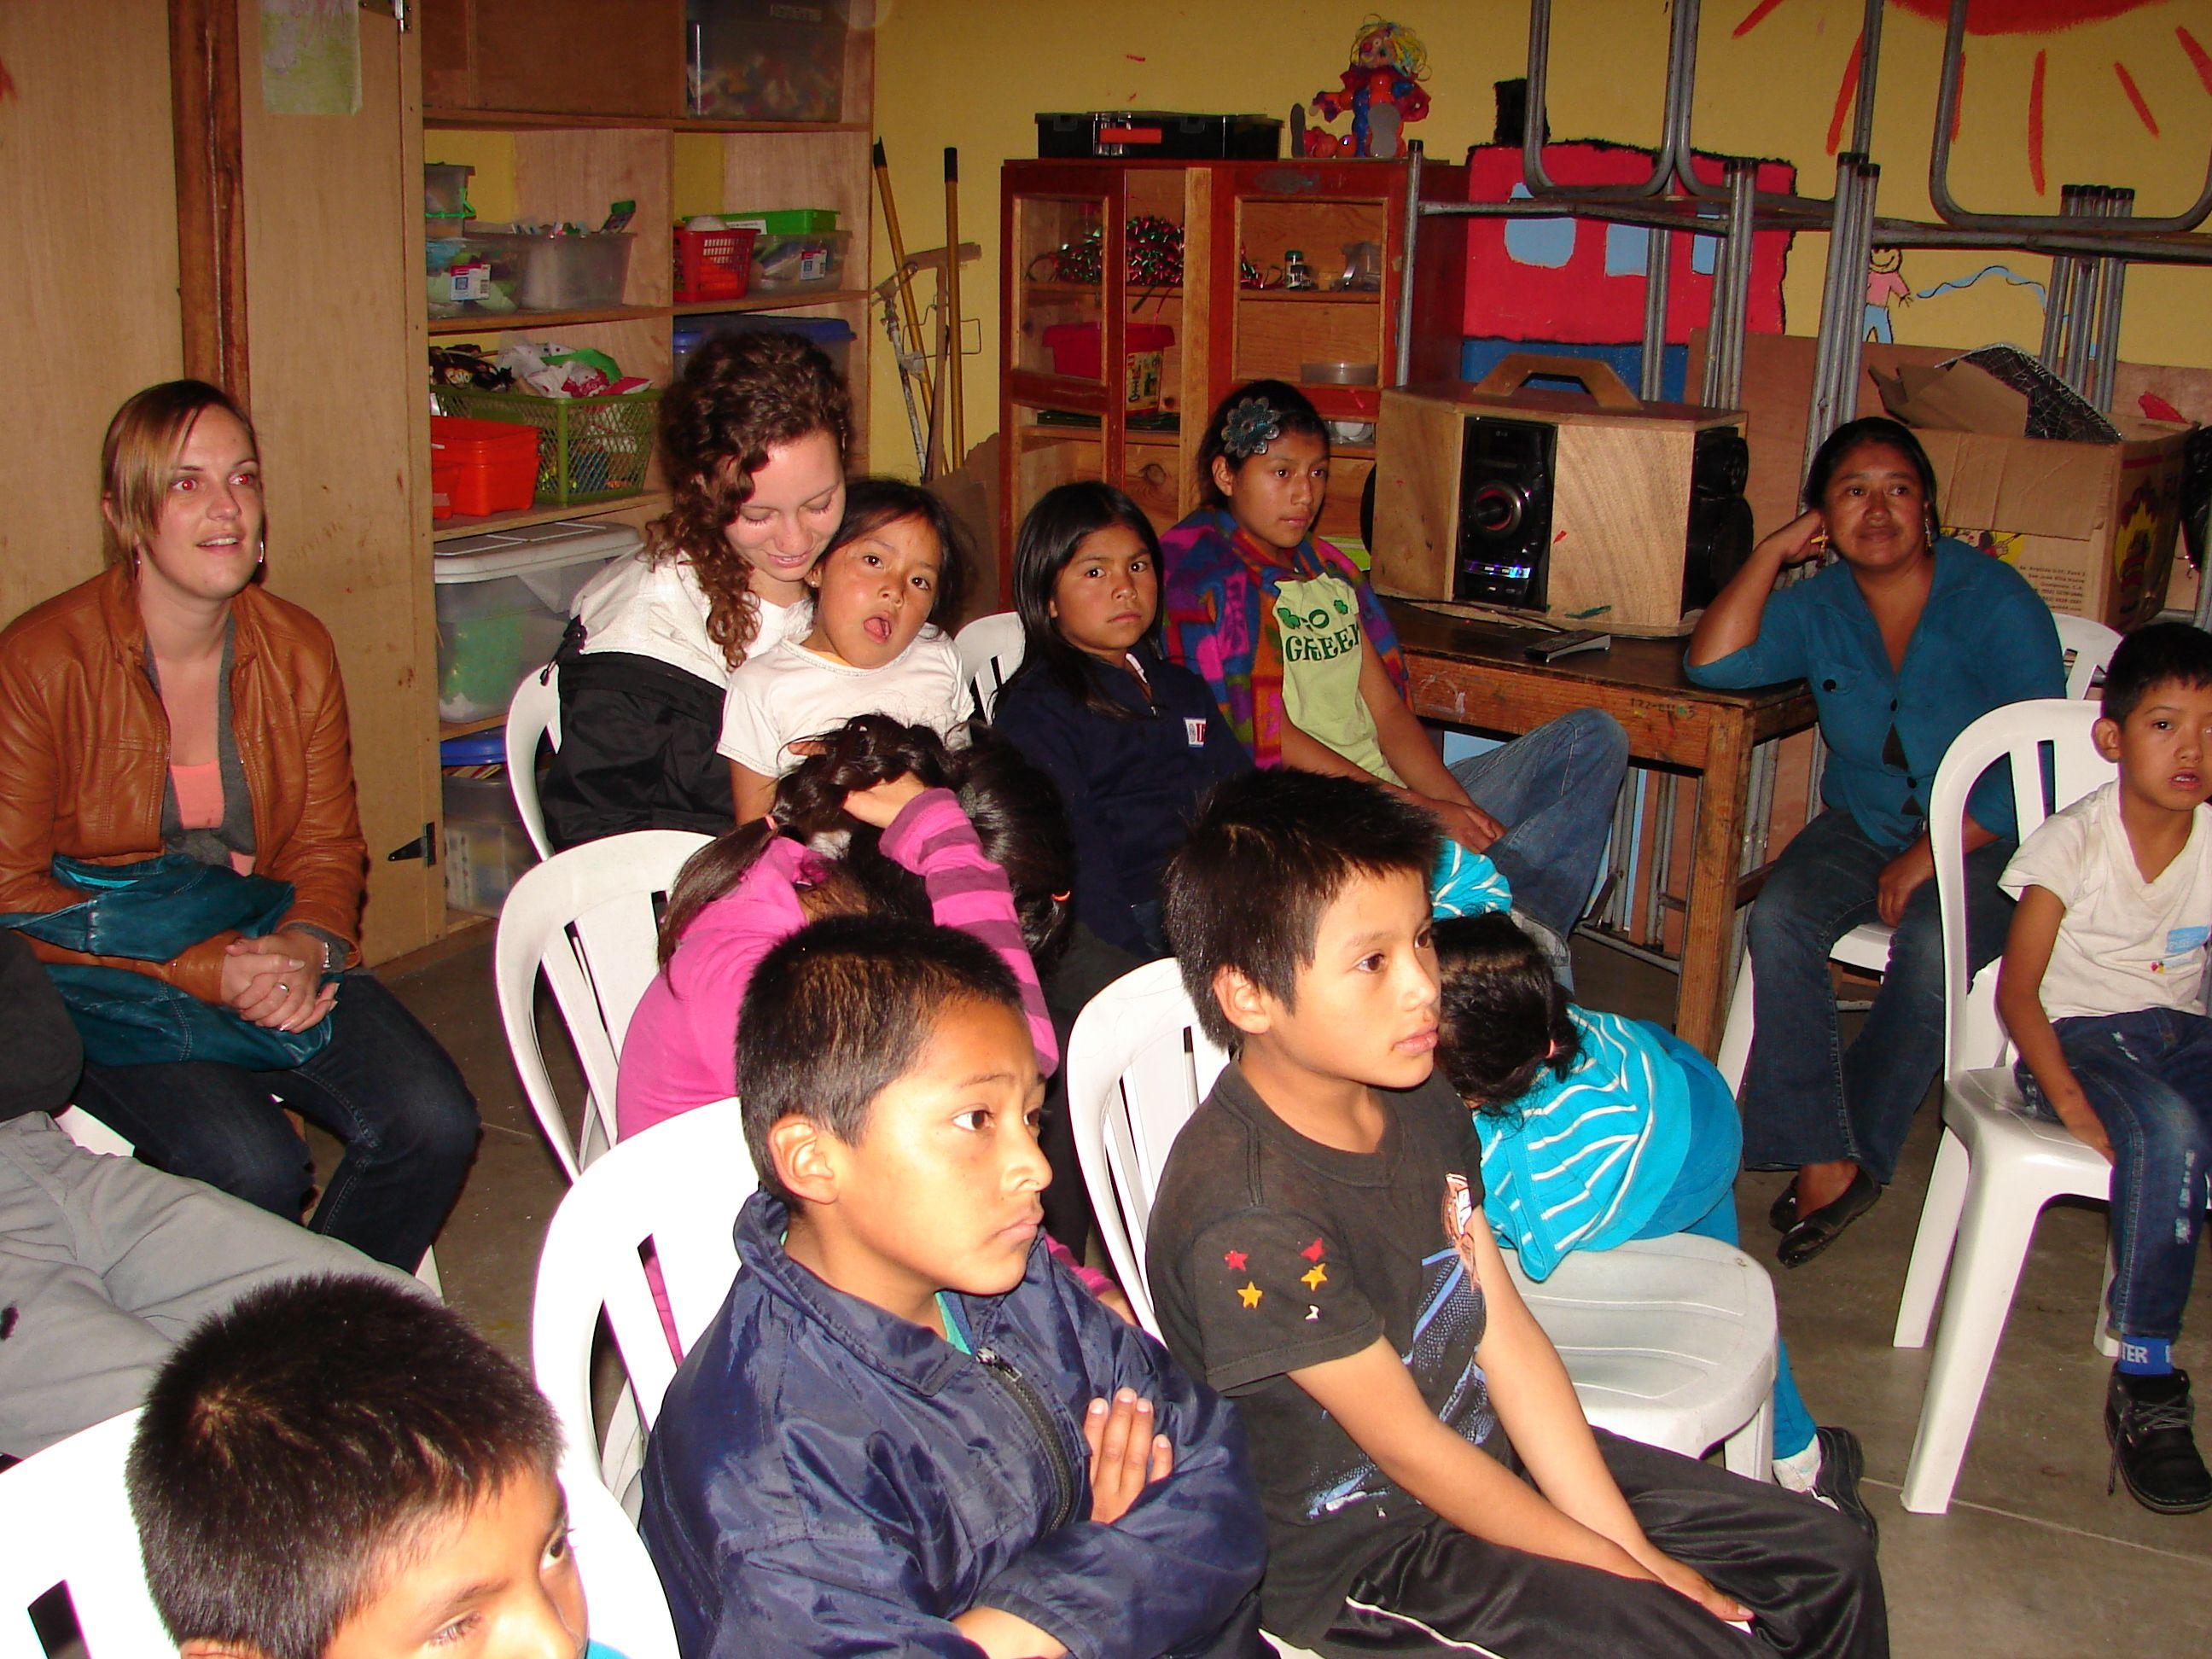 online in dating subscription Quetzaltenango Non